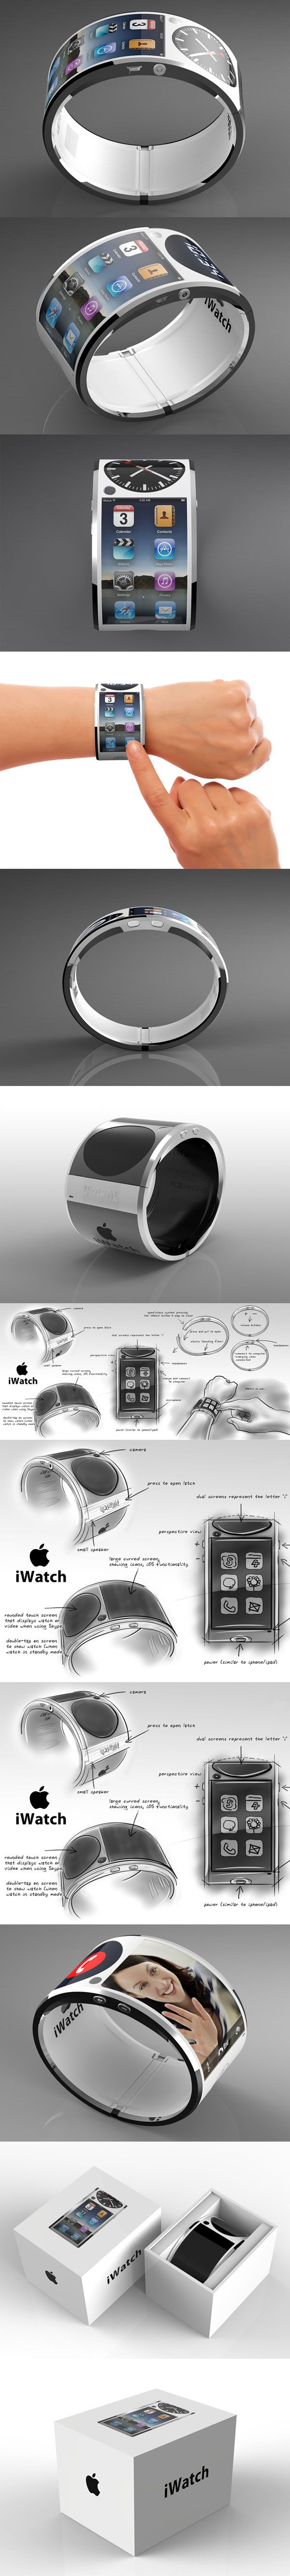 iWatch! Concept by James Ivaldi #design #concept #geek #apple